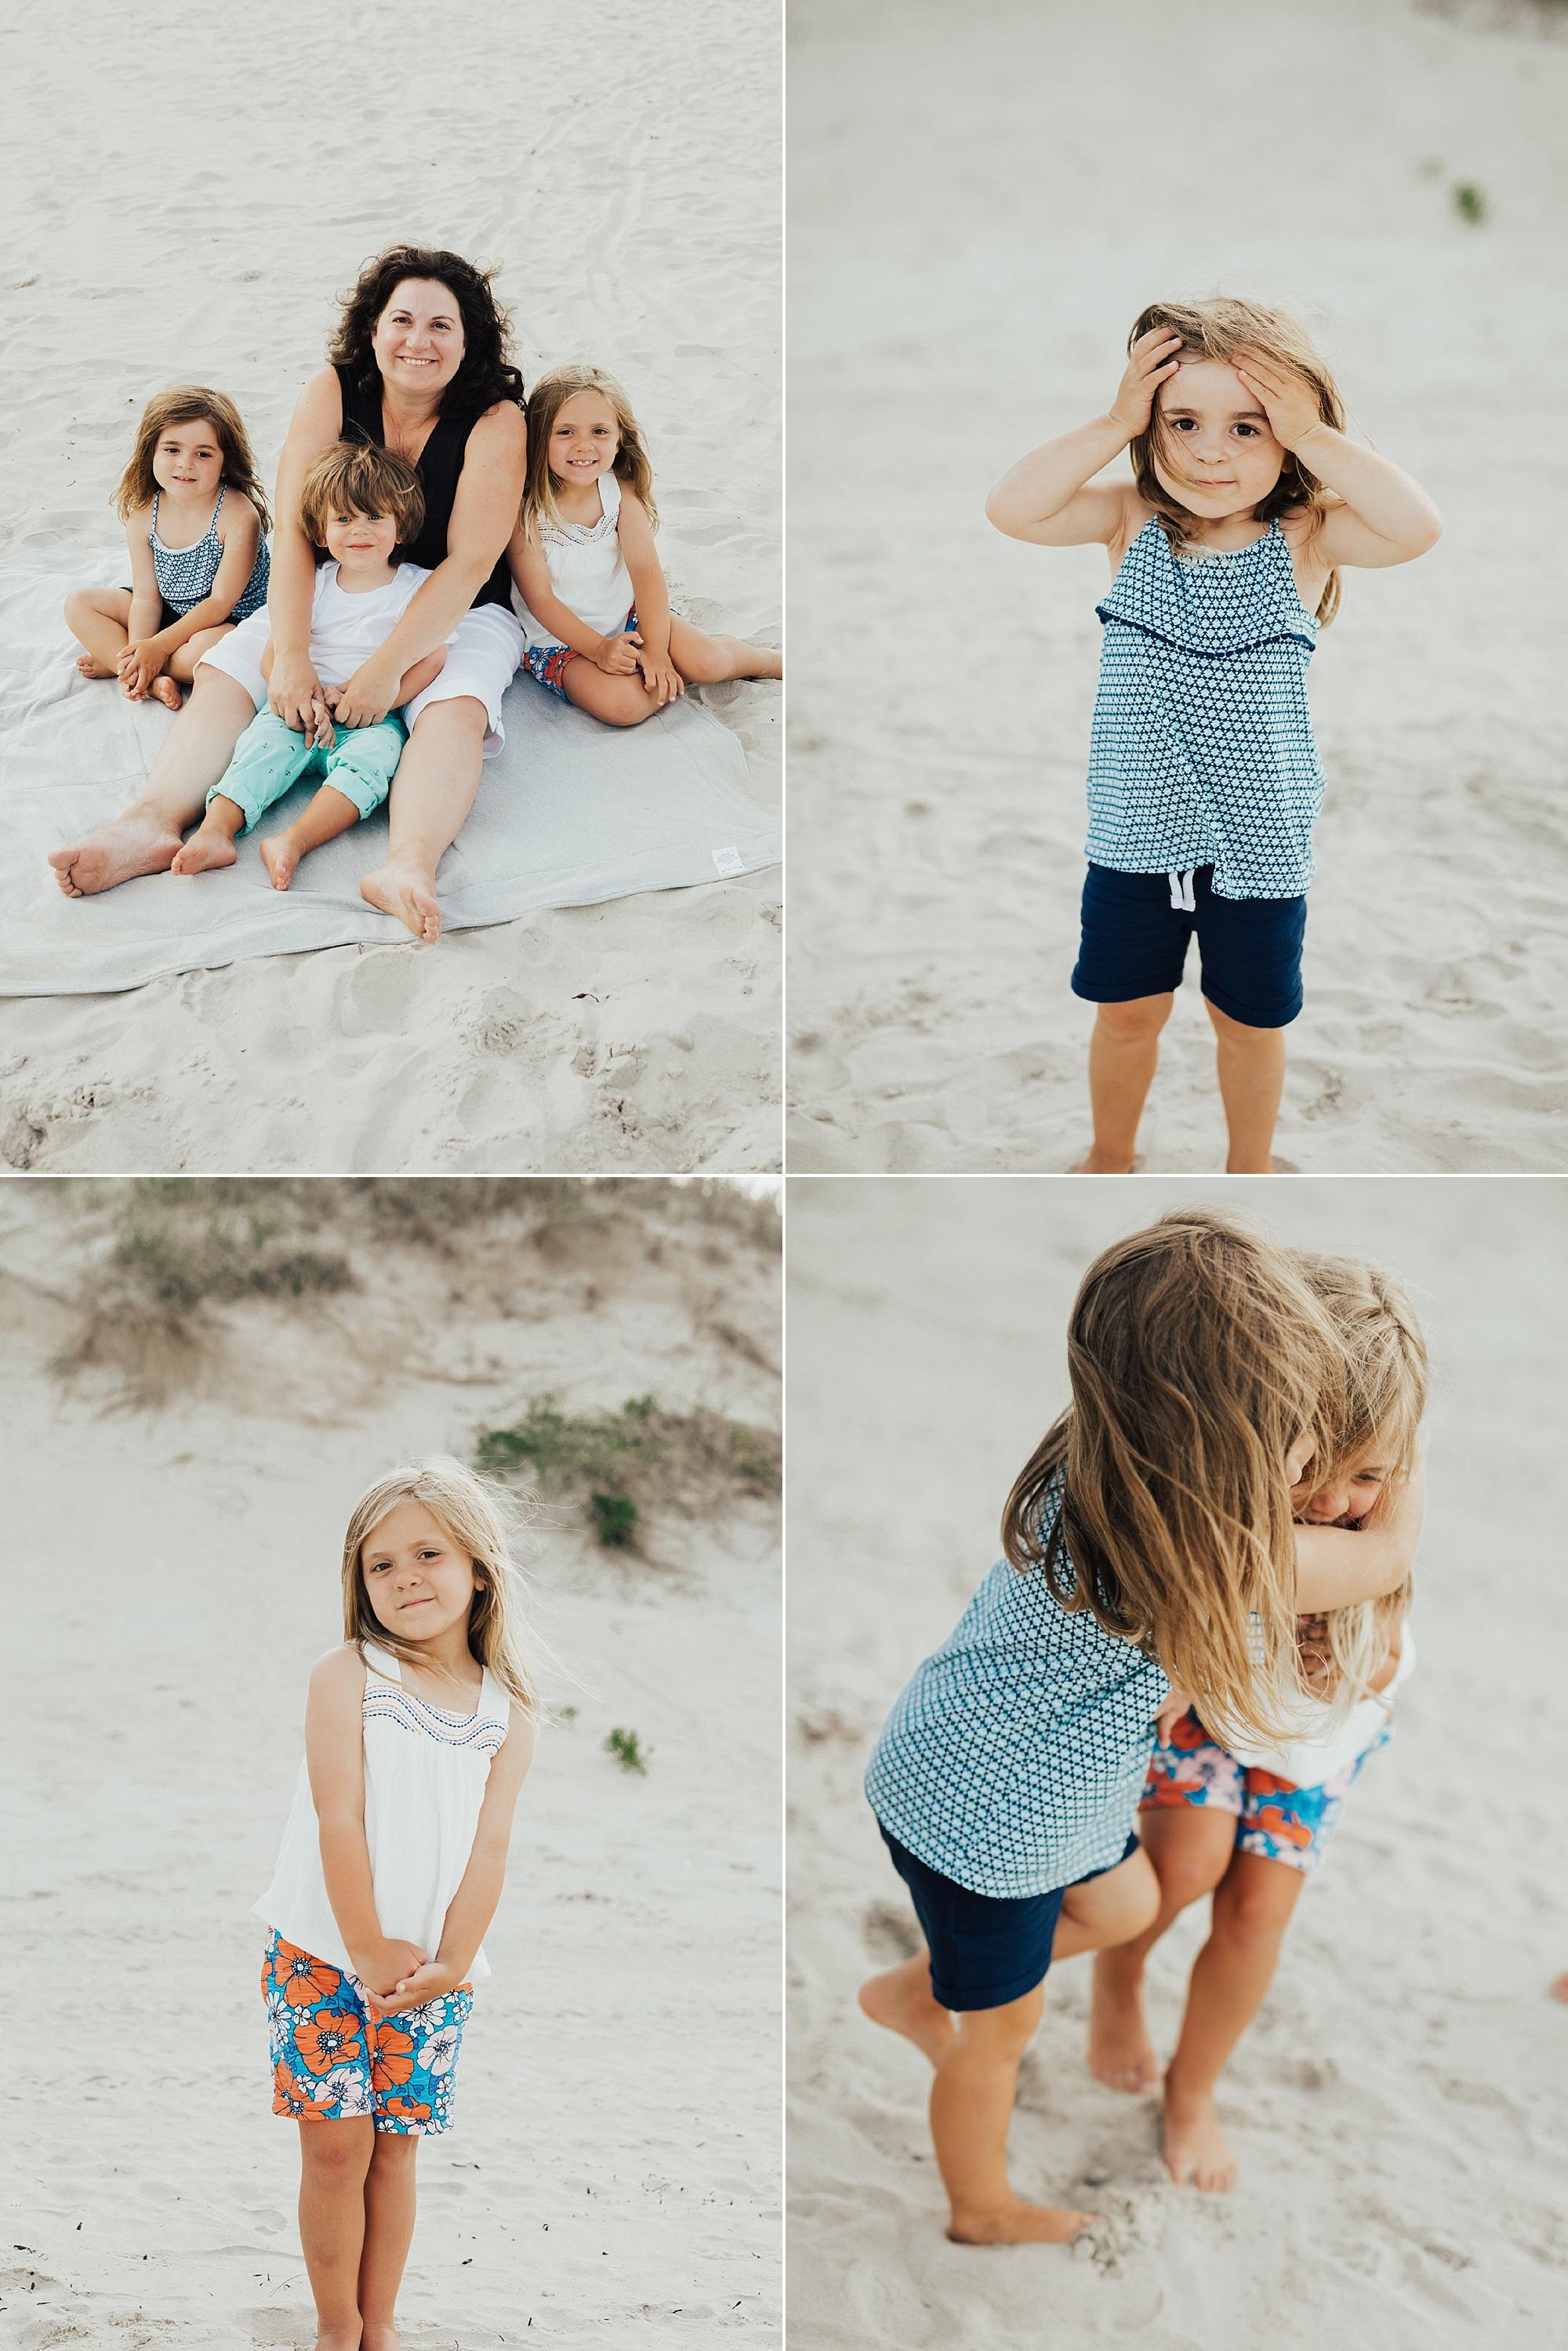 Joe_Mac_Creative_Beach_Family_Photography_OBX_Corolla__0037.jpg